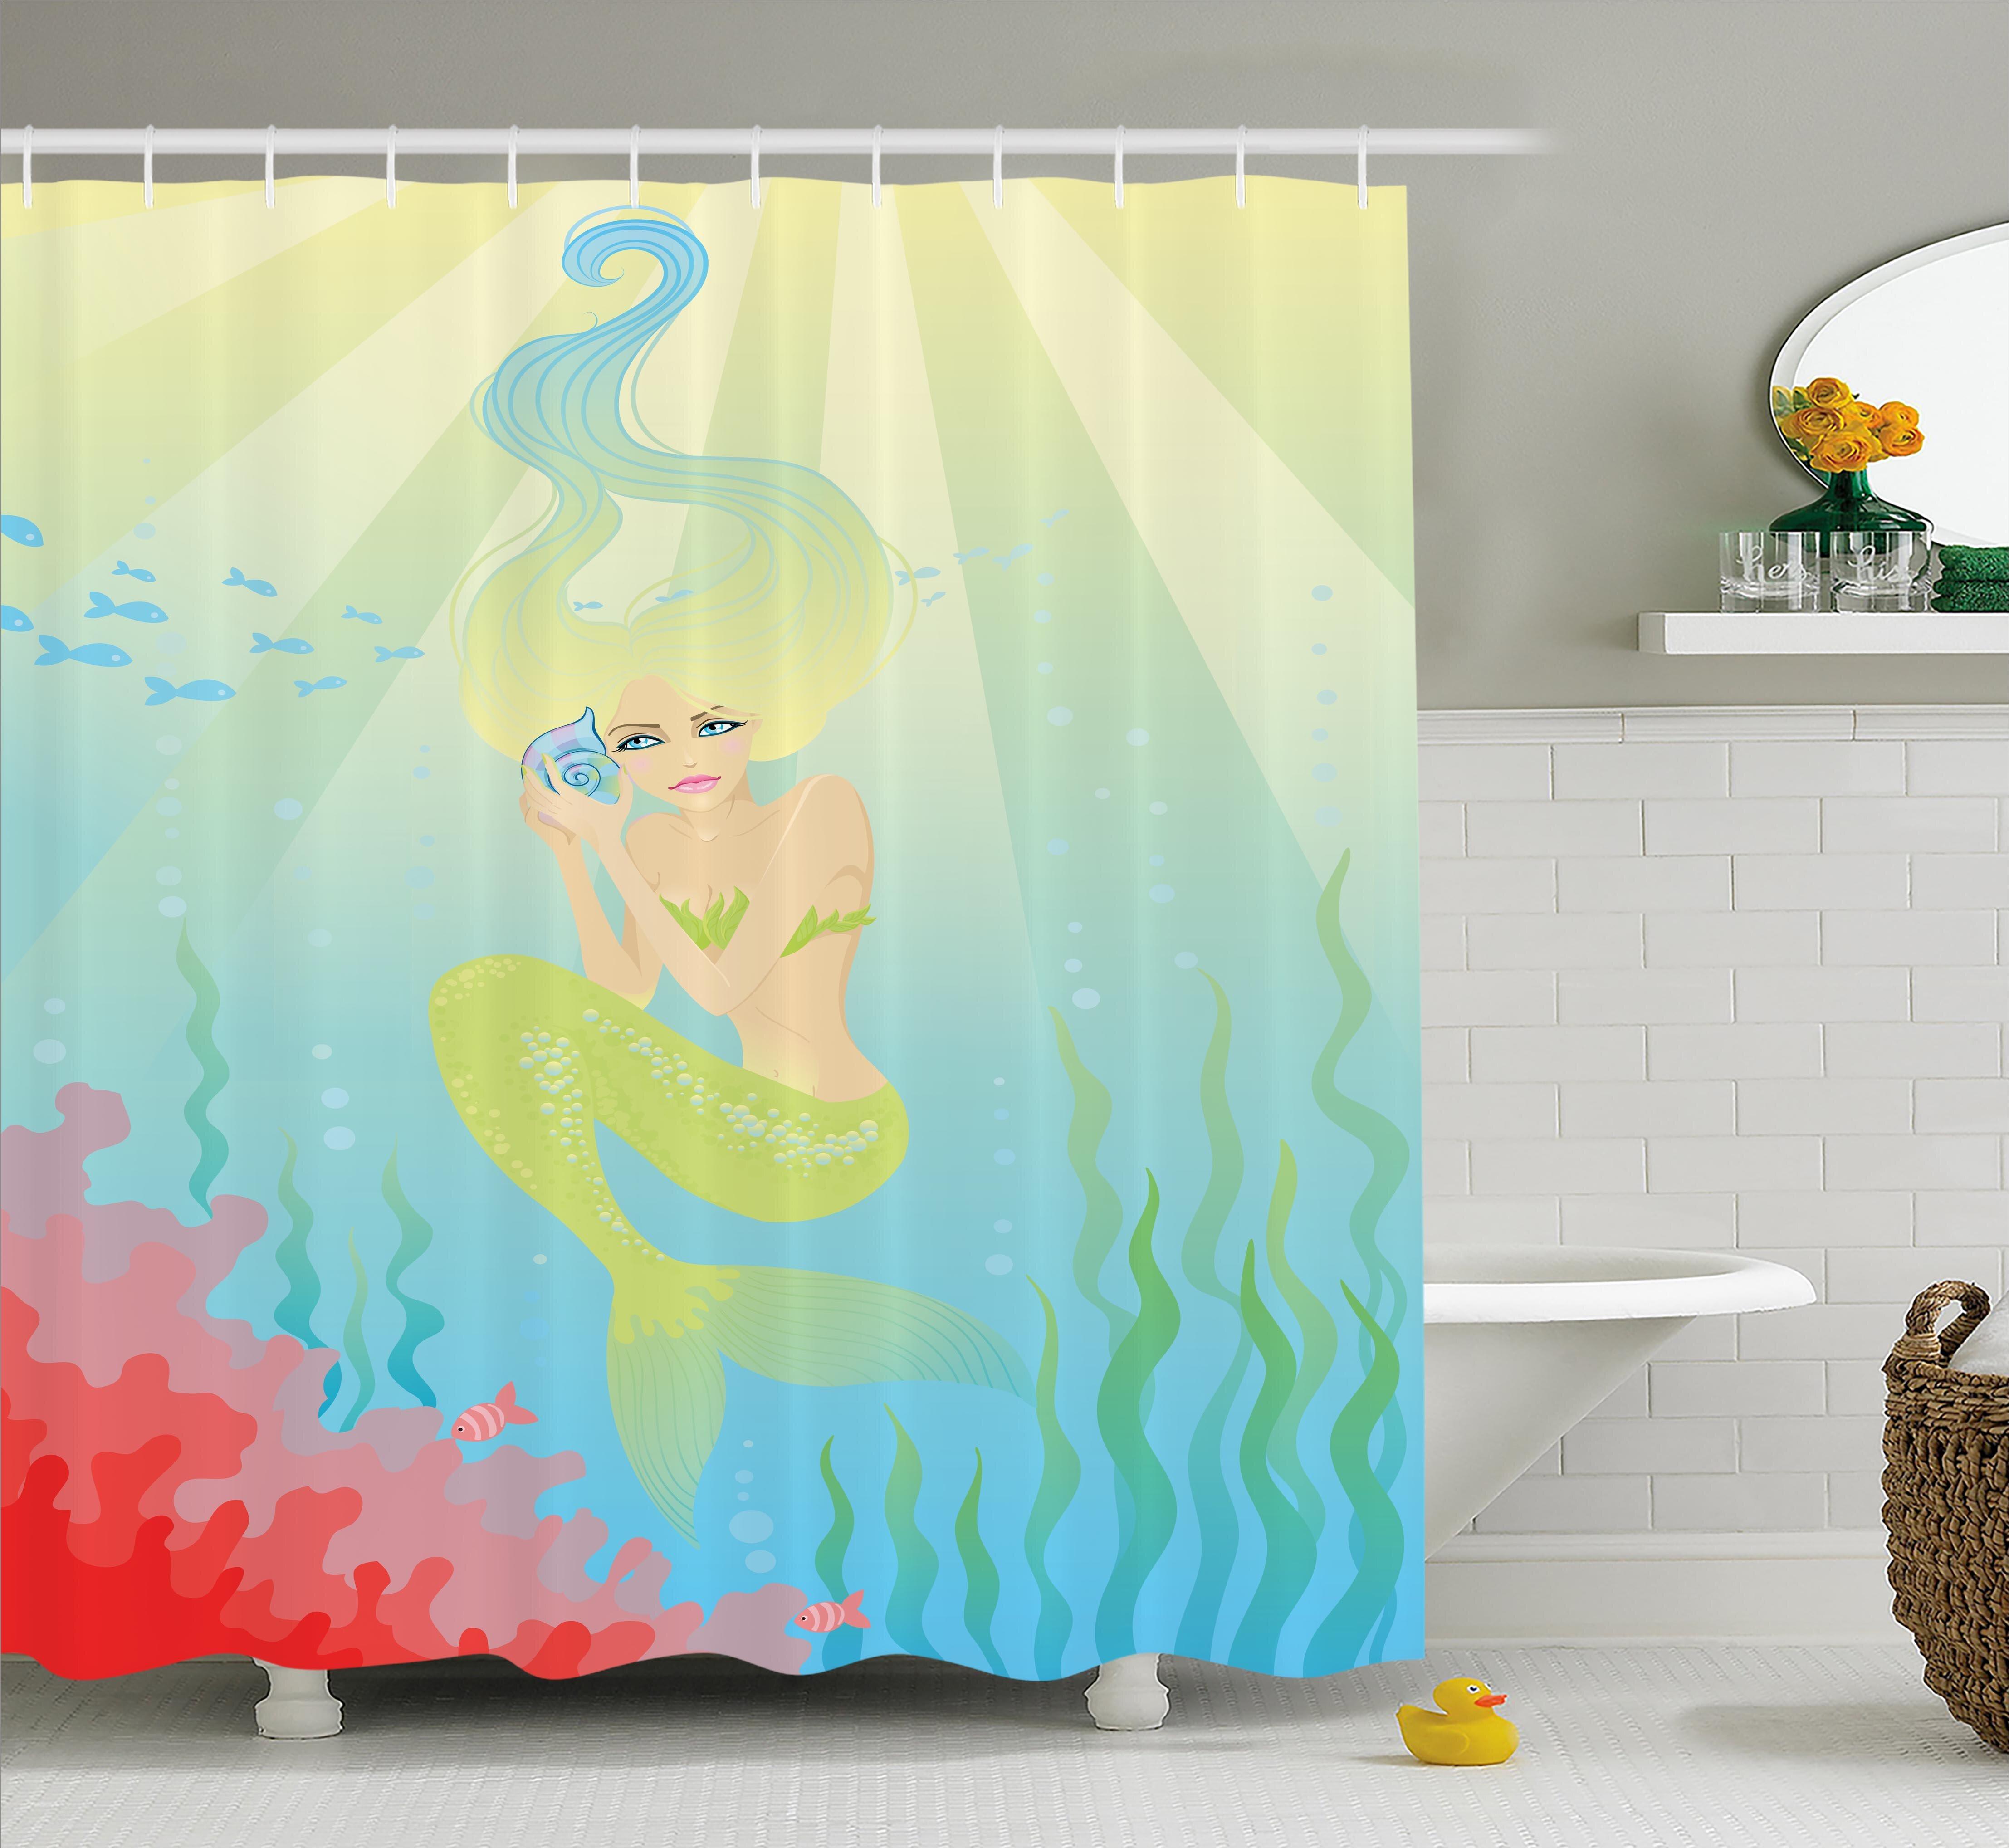 Undersea Palace Mermaid Waterproof Fabric Shower Curtain Set Bathroom Mat Hooks